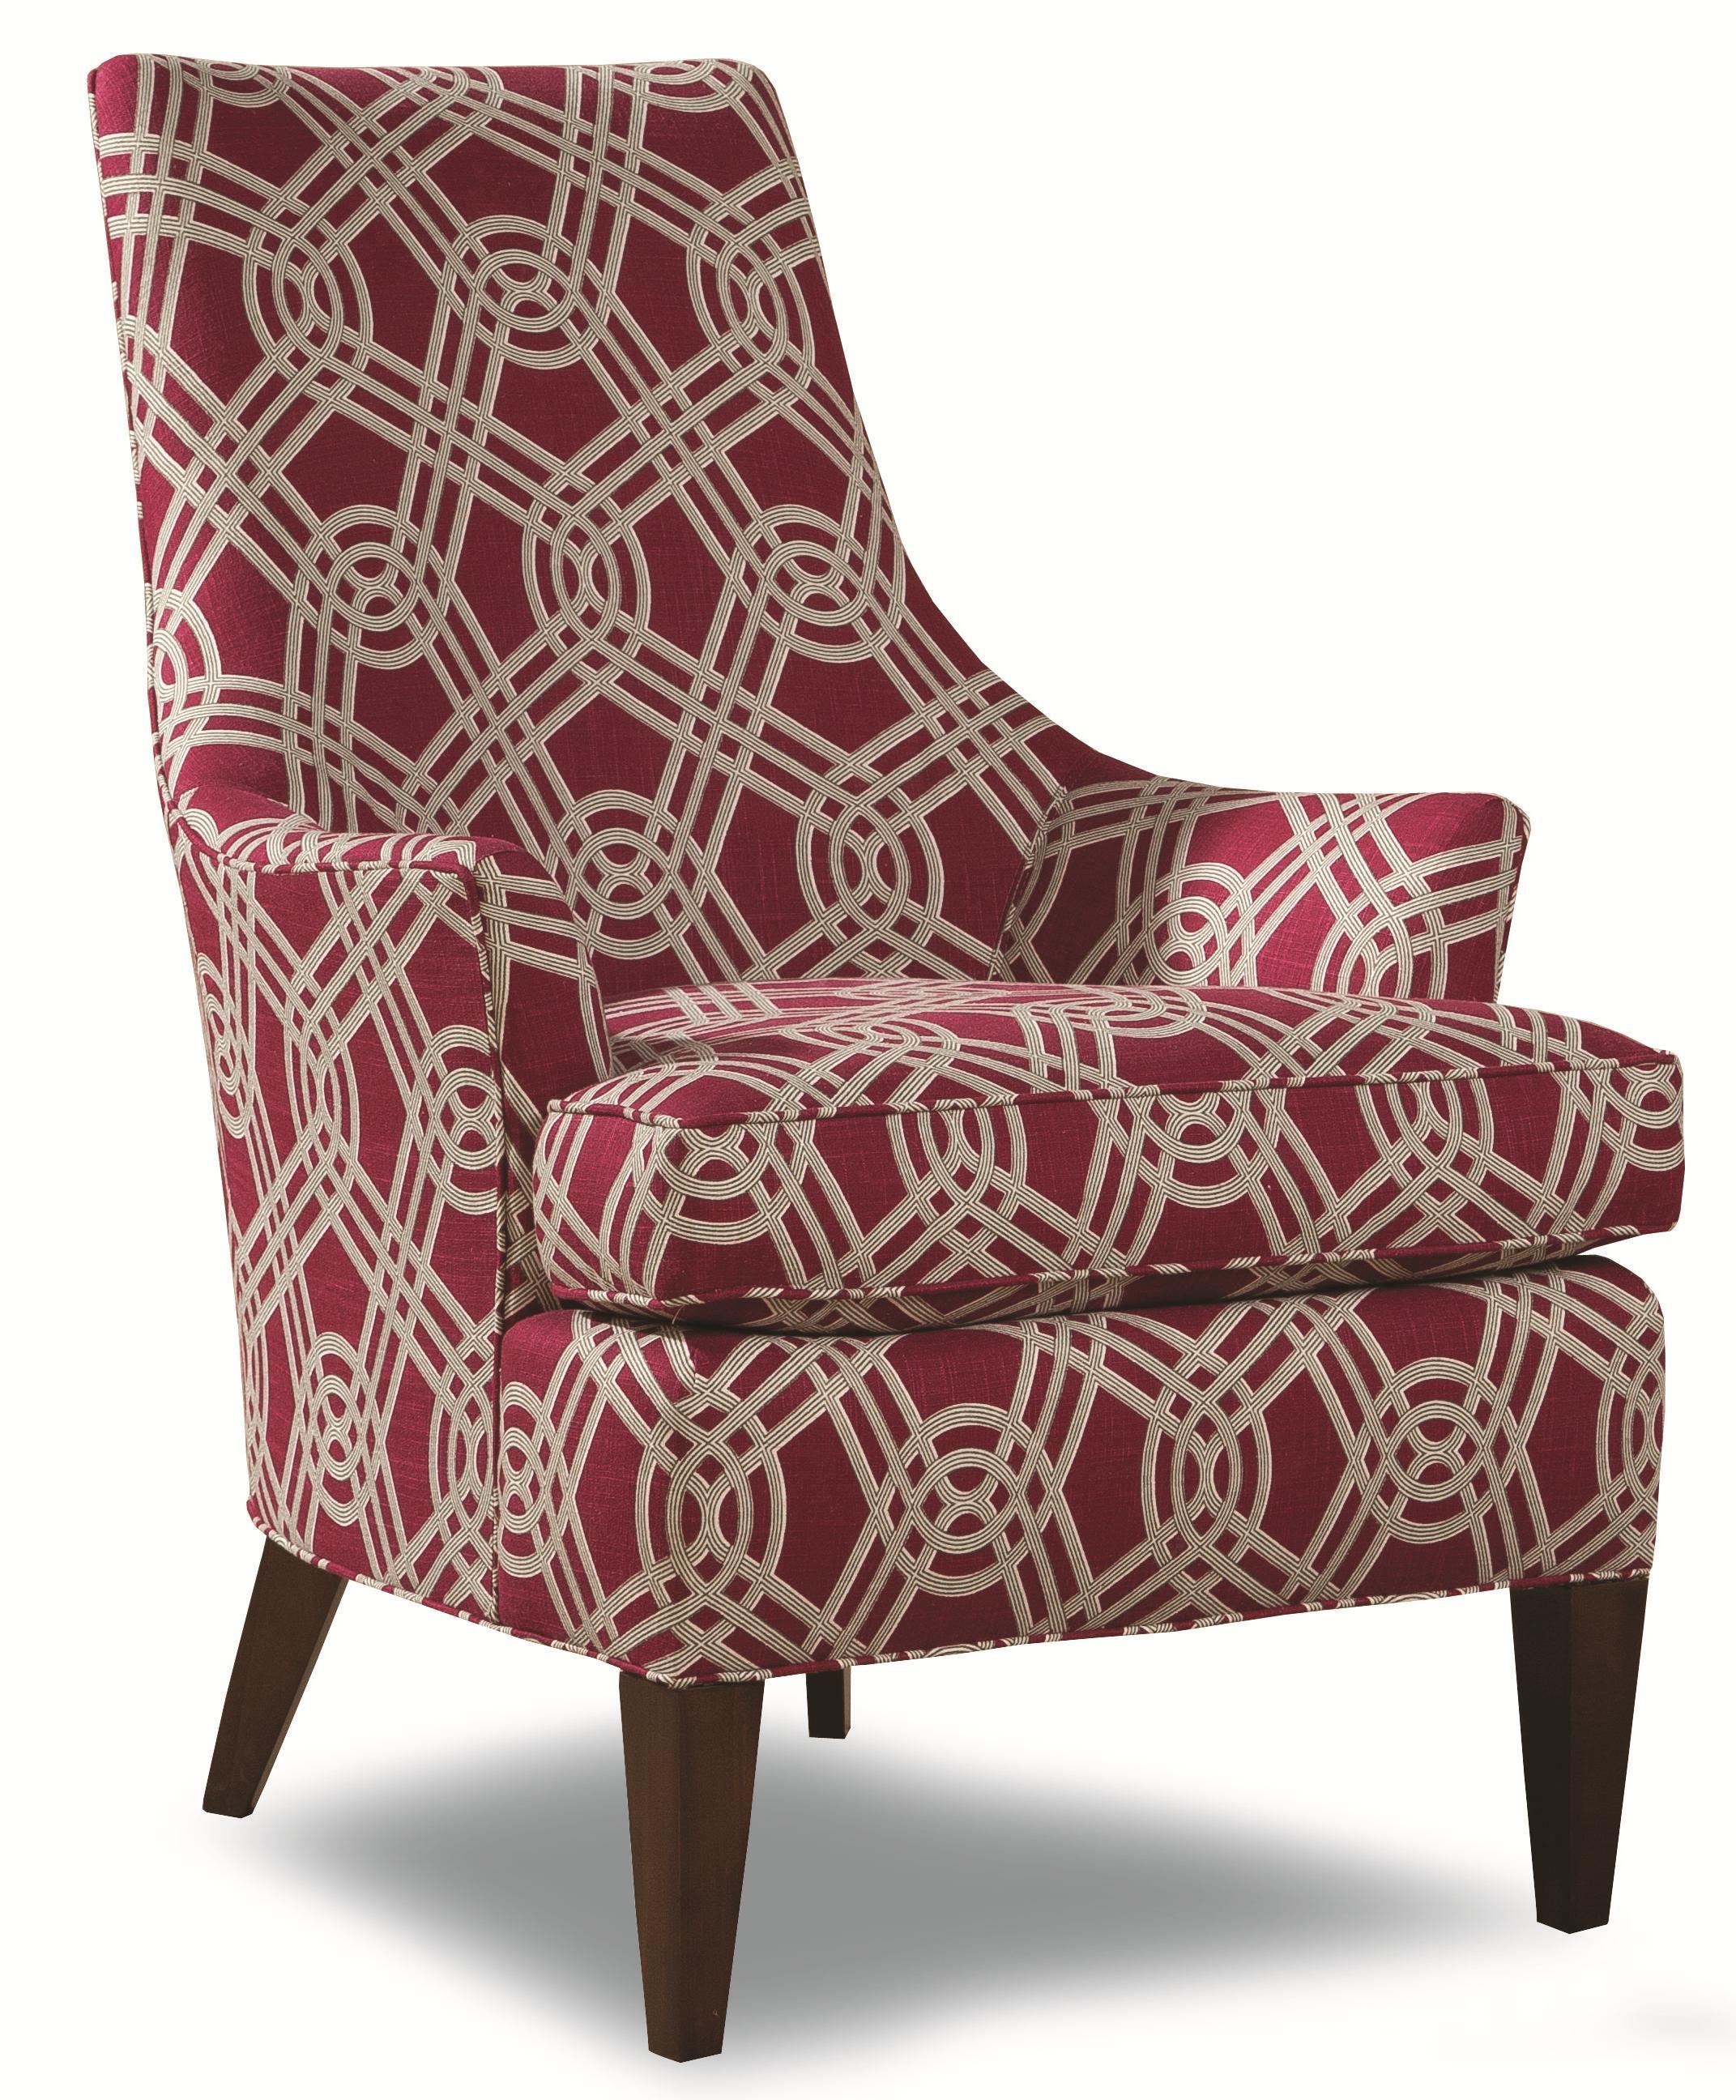 7471 Contemporary Accent Chair by Geoffrey Alexander at Sprintz Furniture